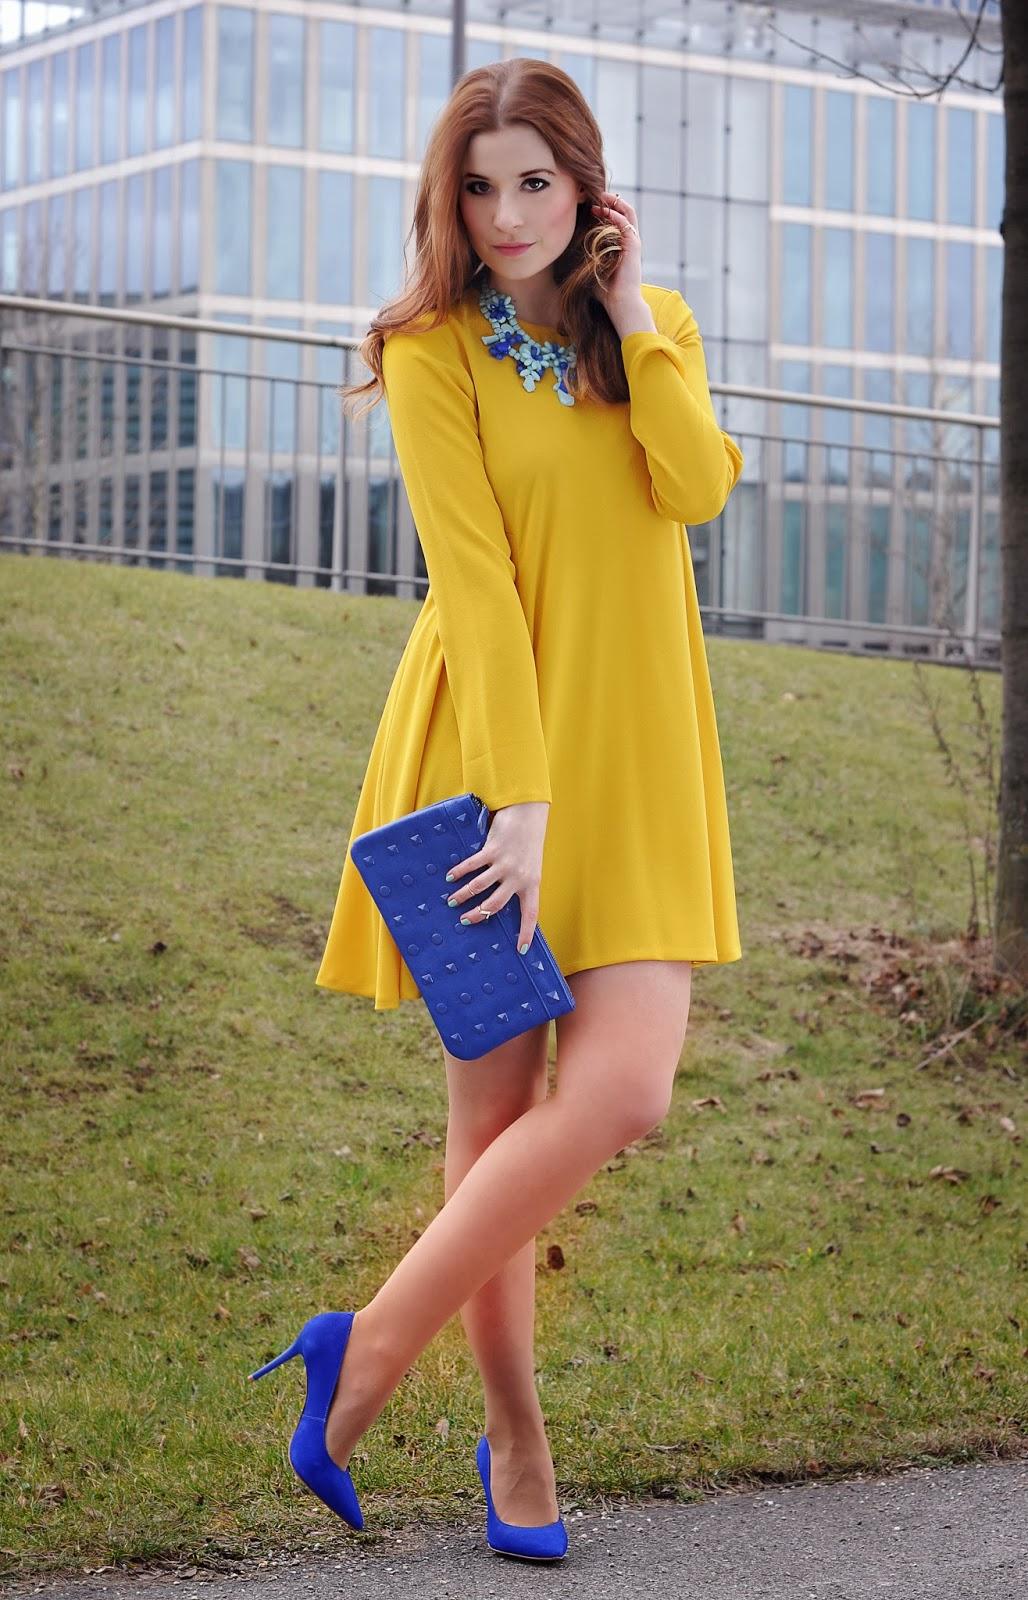 395e0da95c16f Kleid OutfitGelbes Zara OutfitGelbes OutfitGelbes Kleid Zara Zara Kleid  Kleid OutfitGelbes Zara lOikXuPZwT